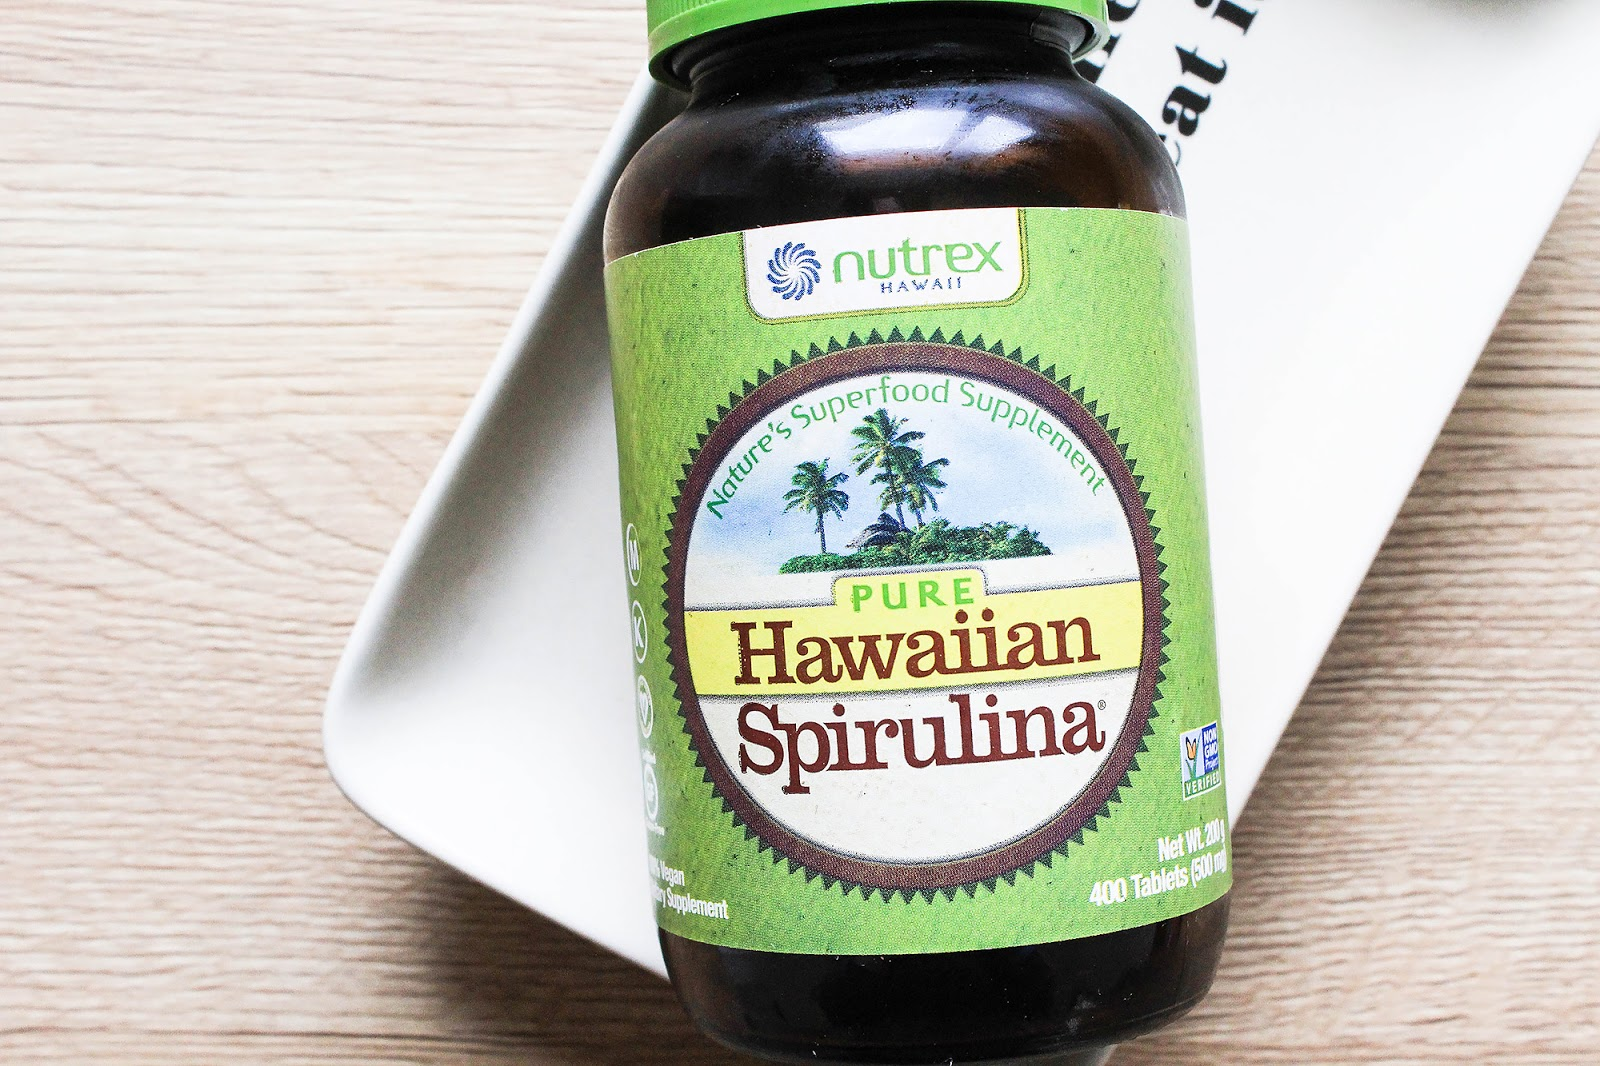 Nutrex Hawaii Pure Hawaiian Spirulina. Vegan, Non-GMO, Gluten Free.